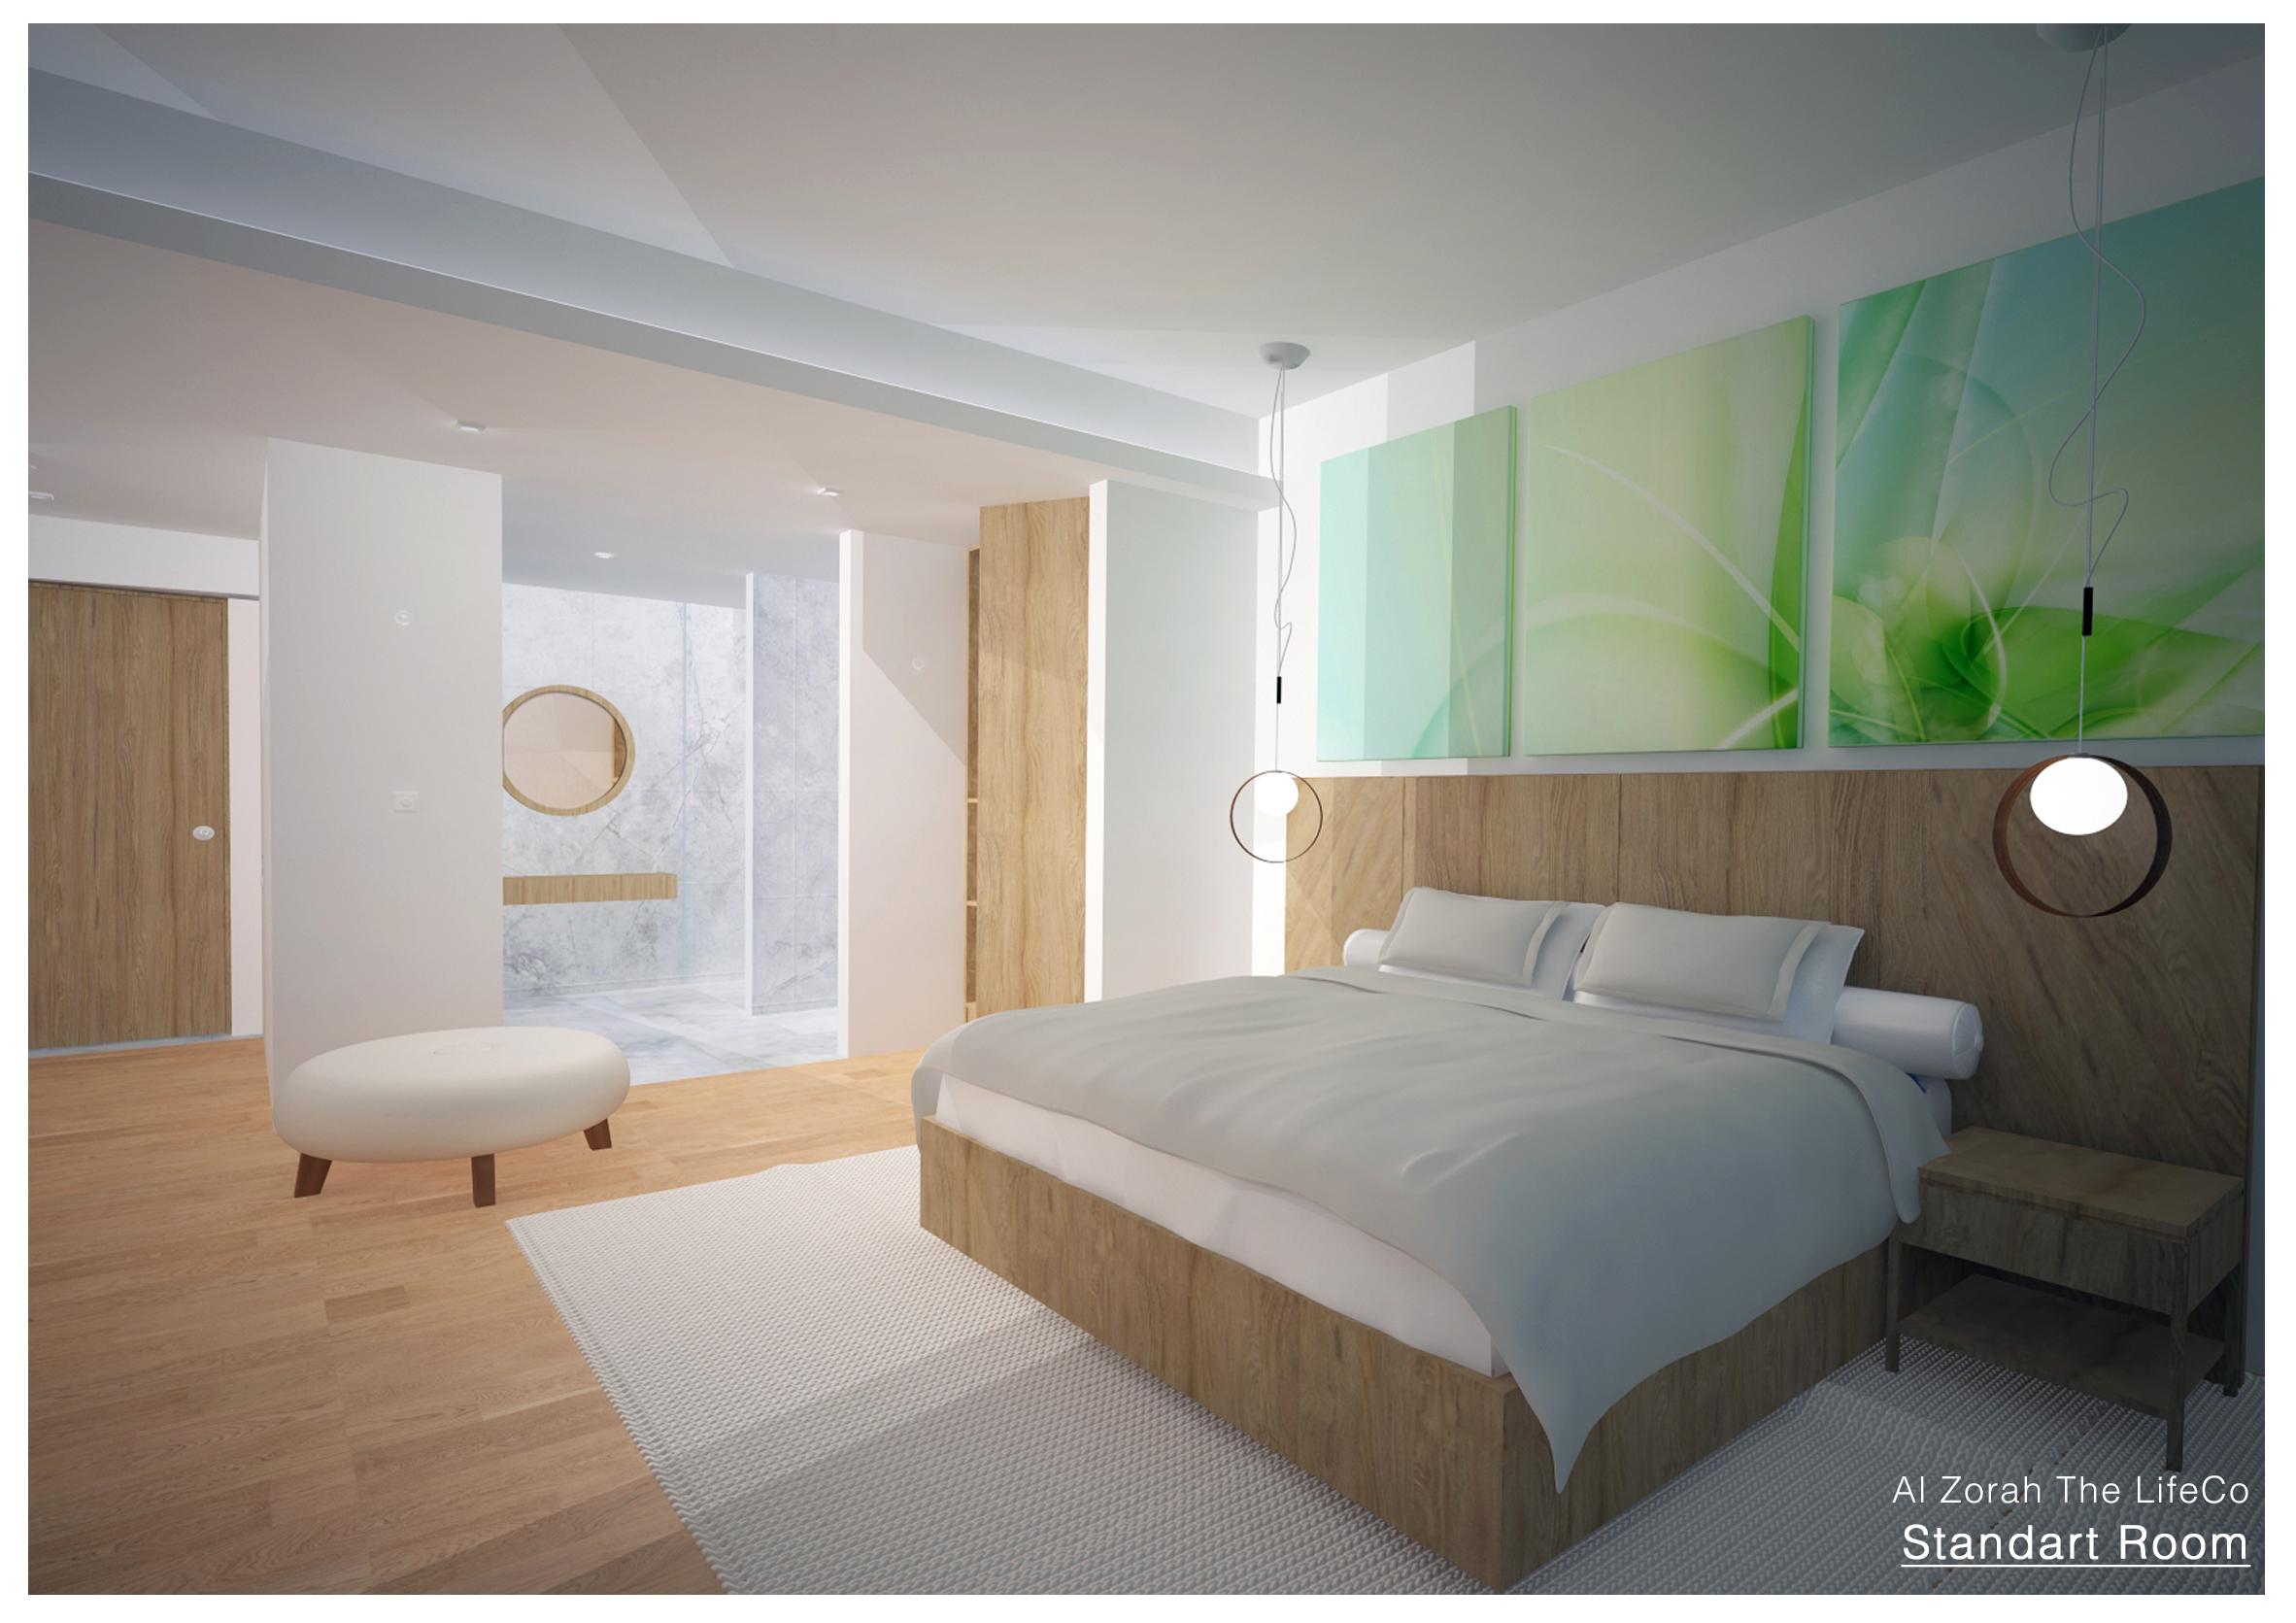 02_standart-room-2